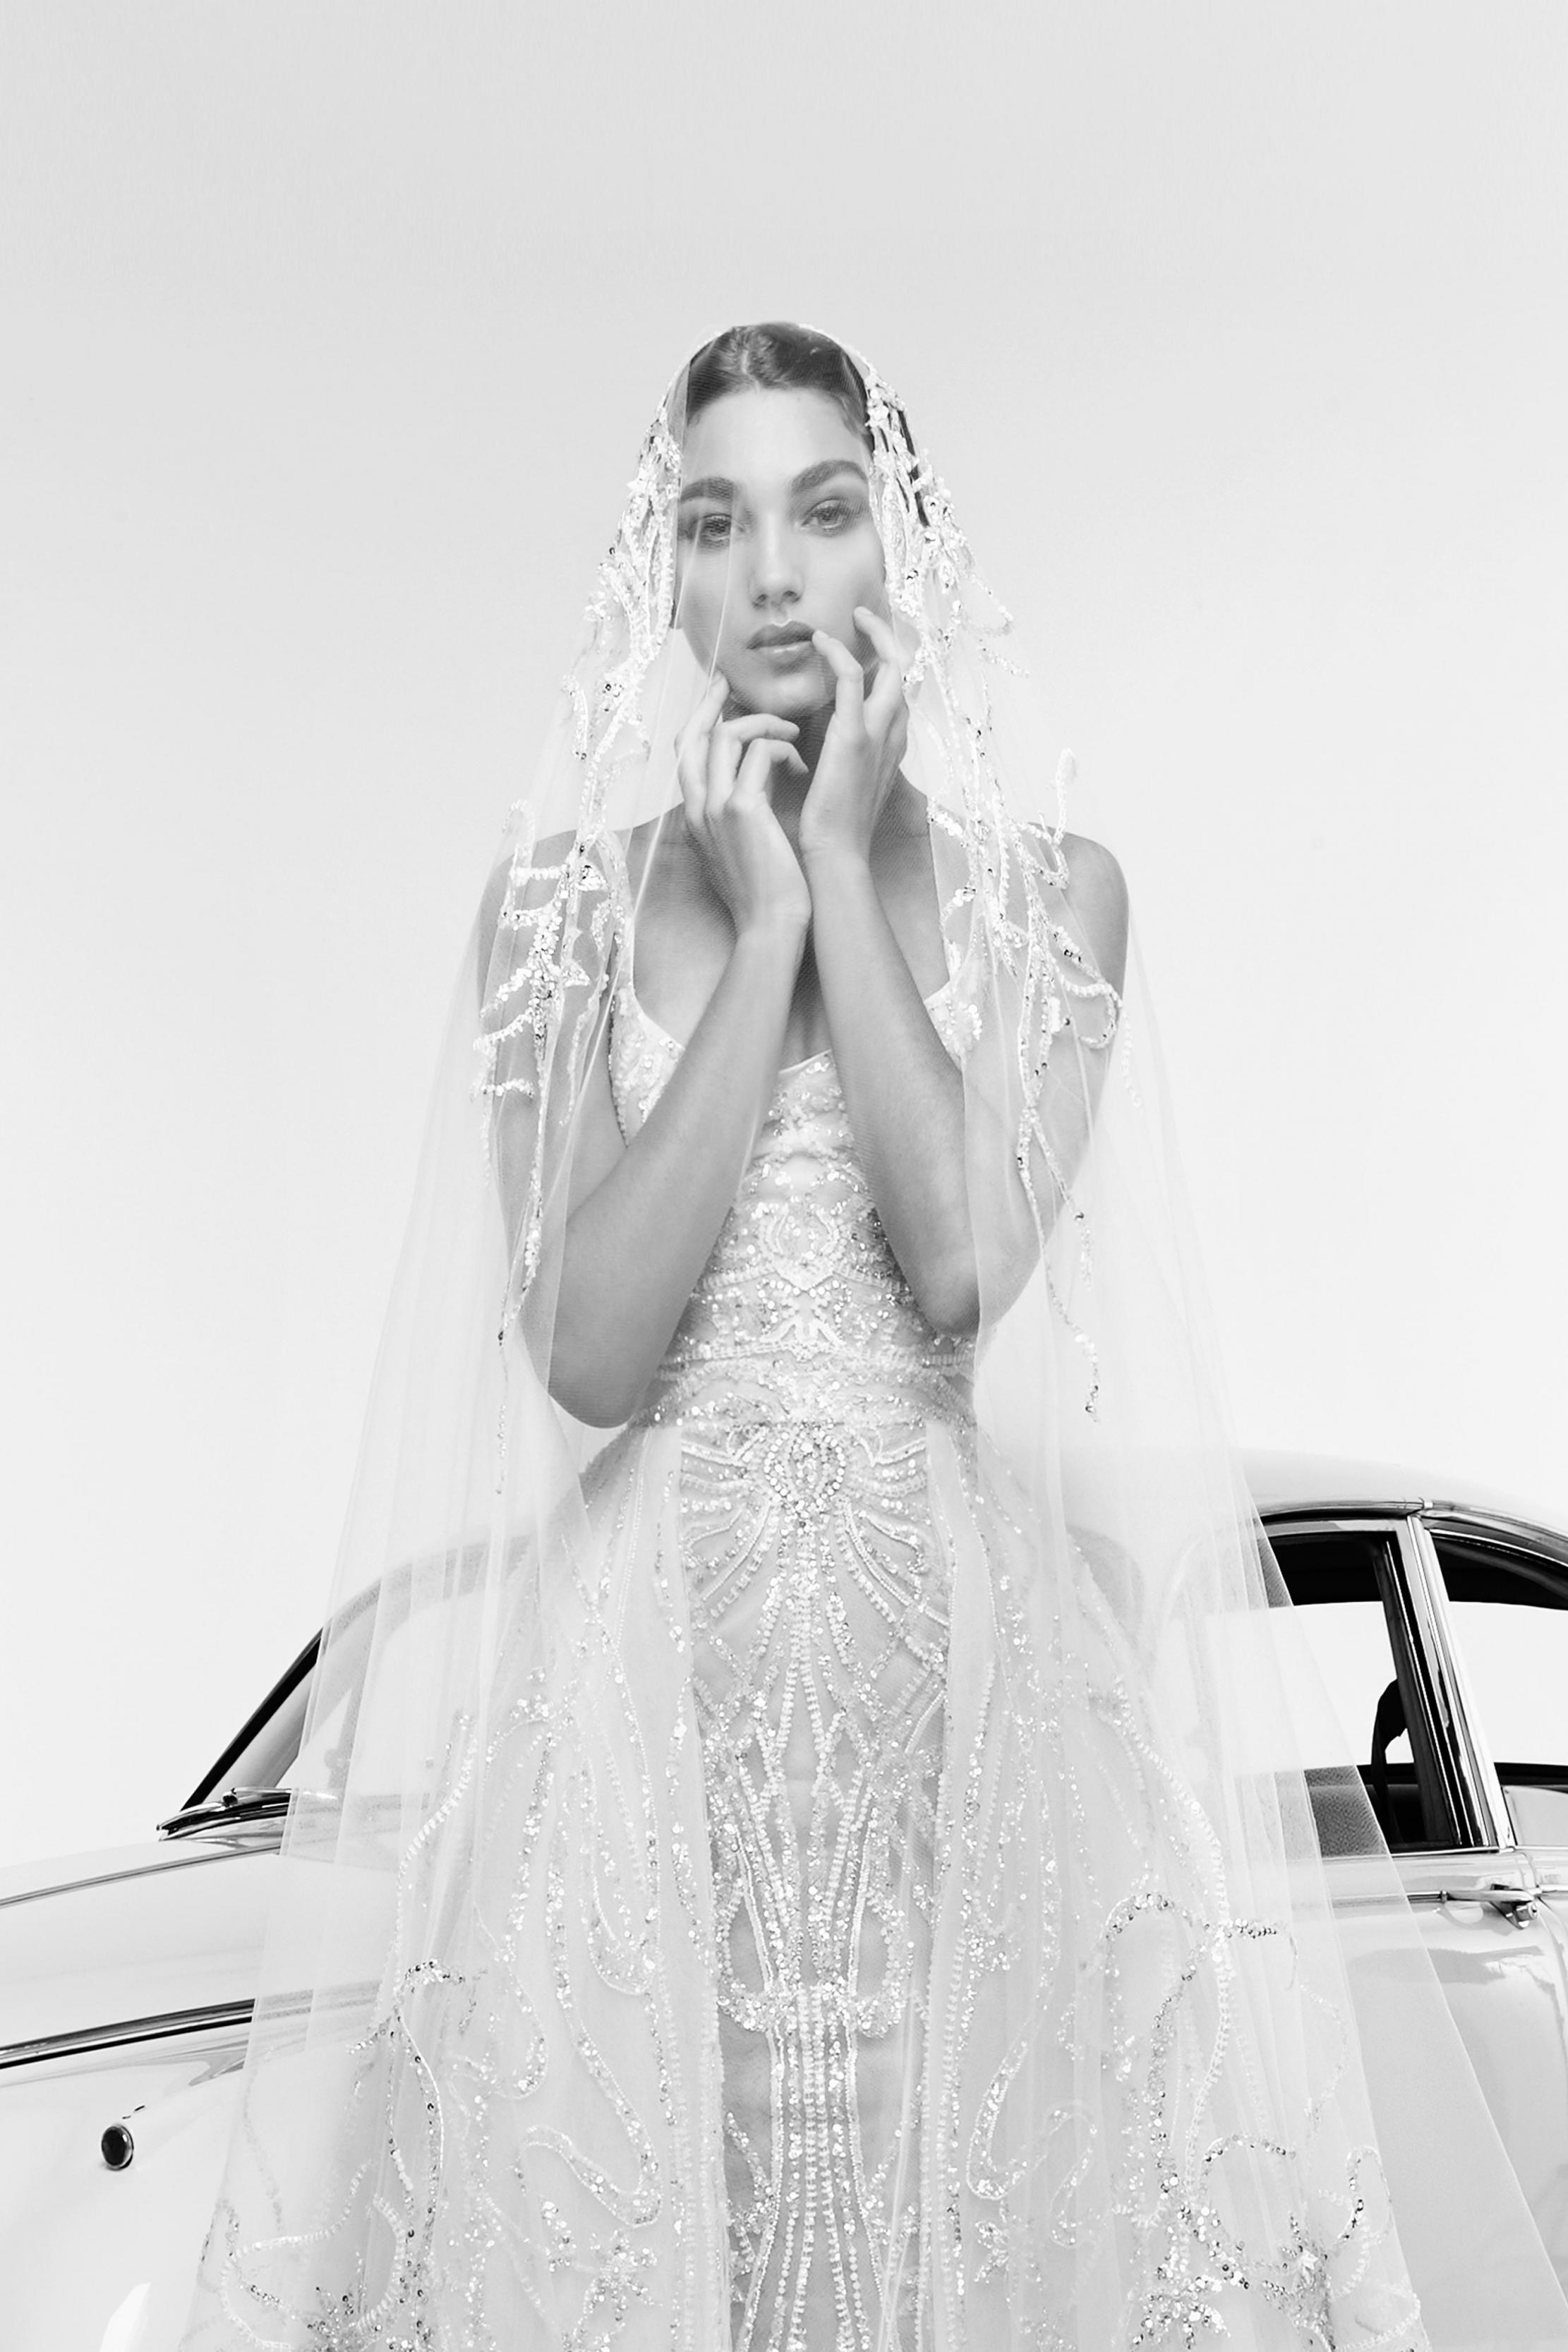 بالصور فساتين زفاف زهير مراد 2019 , فساتين زفاف زهير مراد واجمد فساتين 5814 10